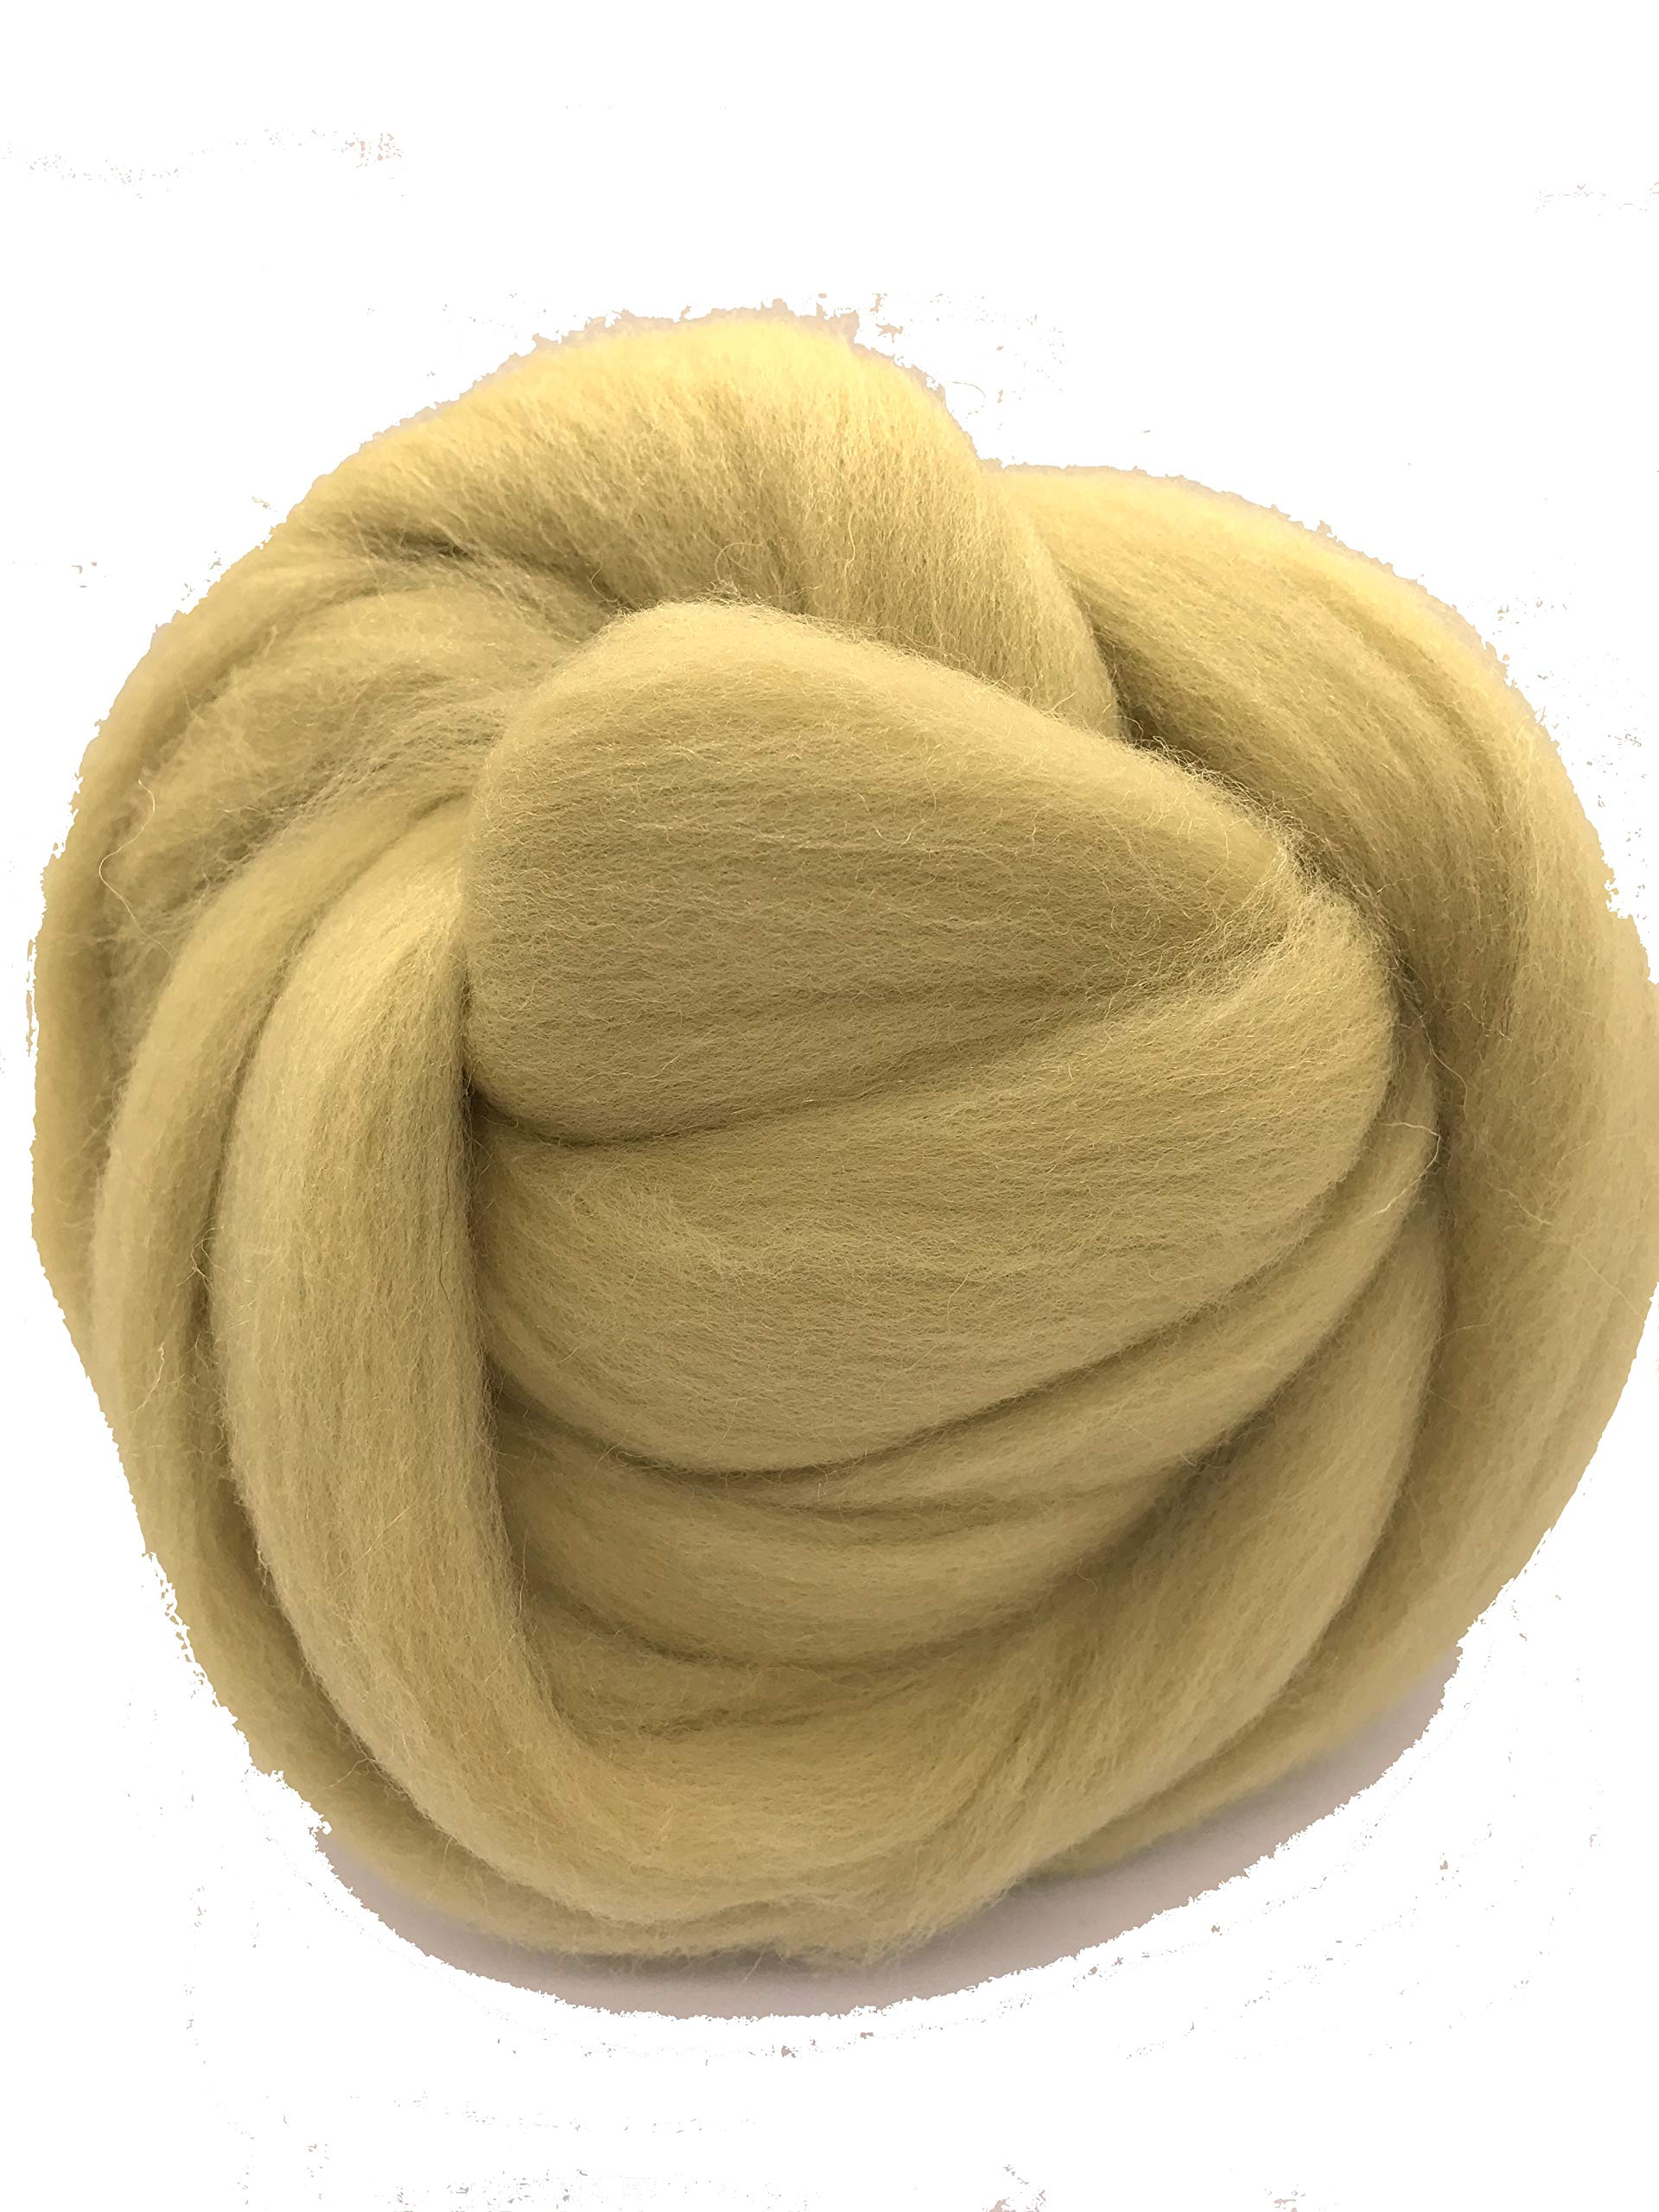 Tan Wool Roving Fiber Spinning, Felting Crafts USA (2lb) Felting wool, spinning wool, flesh tone wool, wool fiber, giant yarn, big yarn, jumbo yarn, chunky yarn, weaving wool, dread wool, Shep's Wool